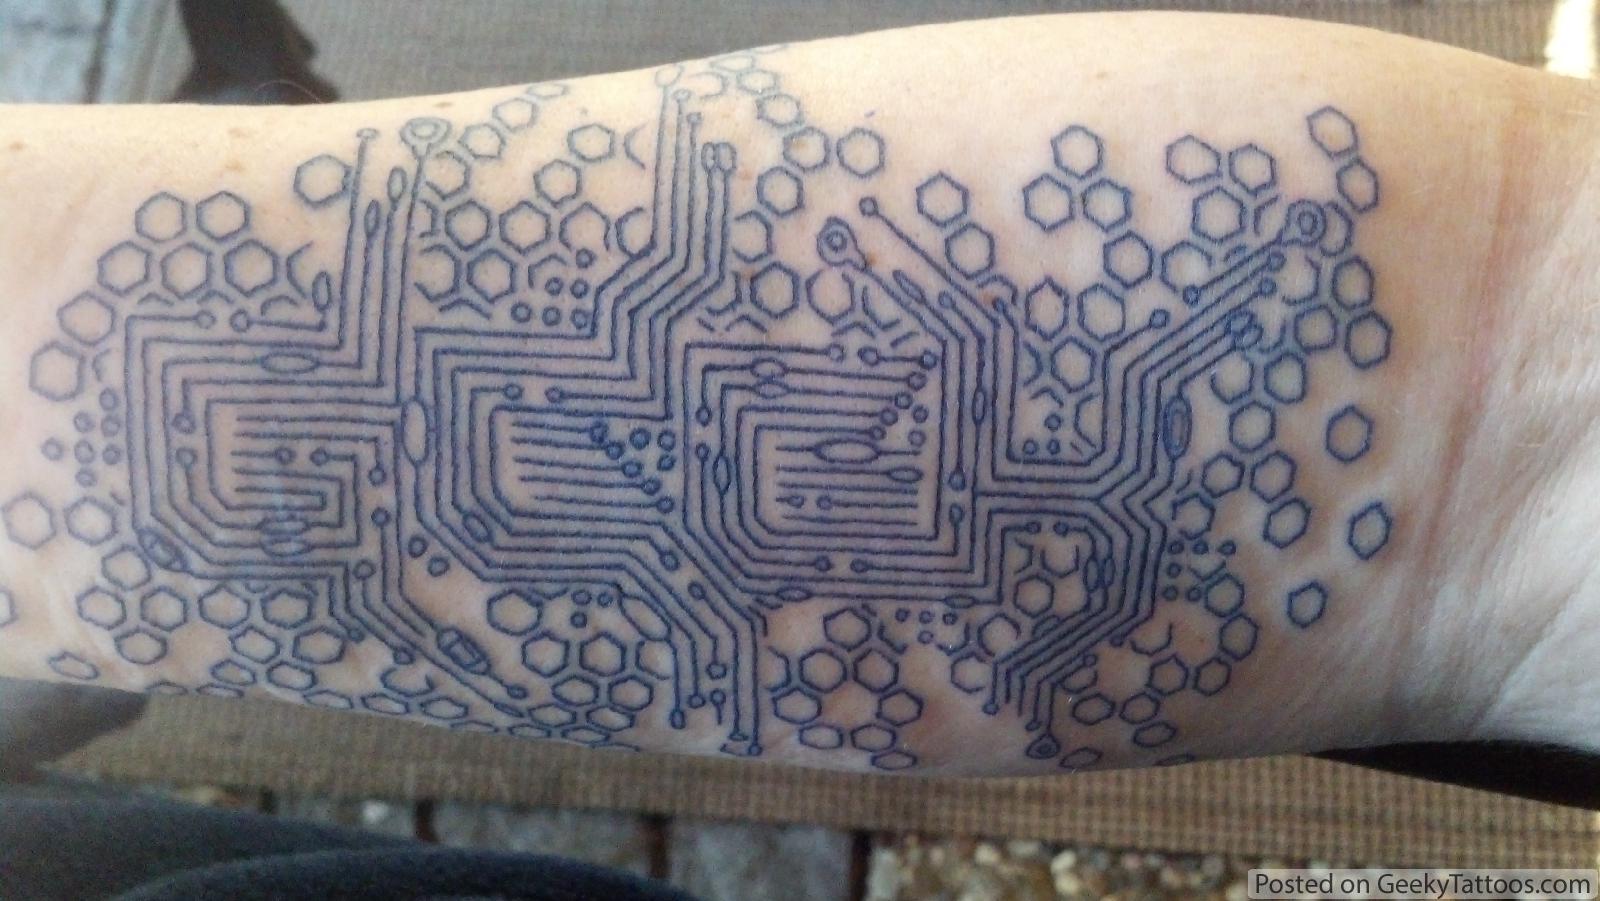 Geeky tattoos for Nerd tattoo designs